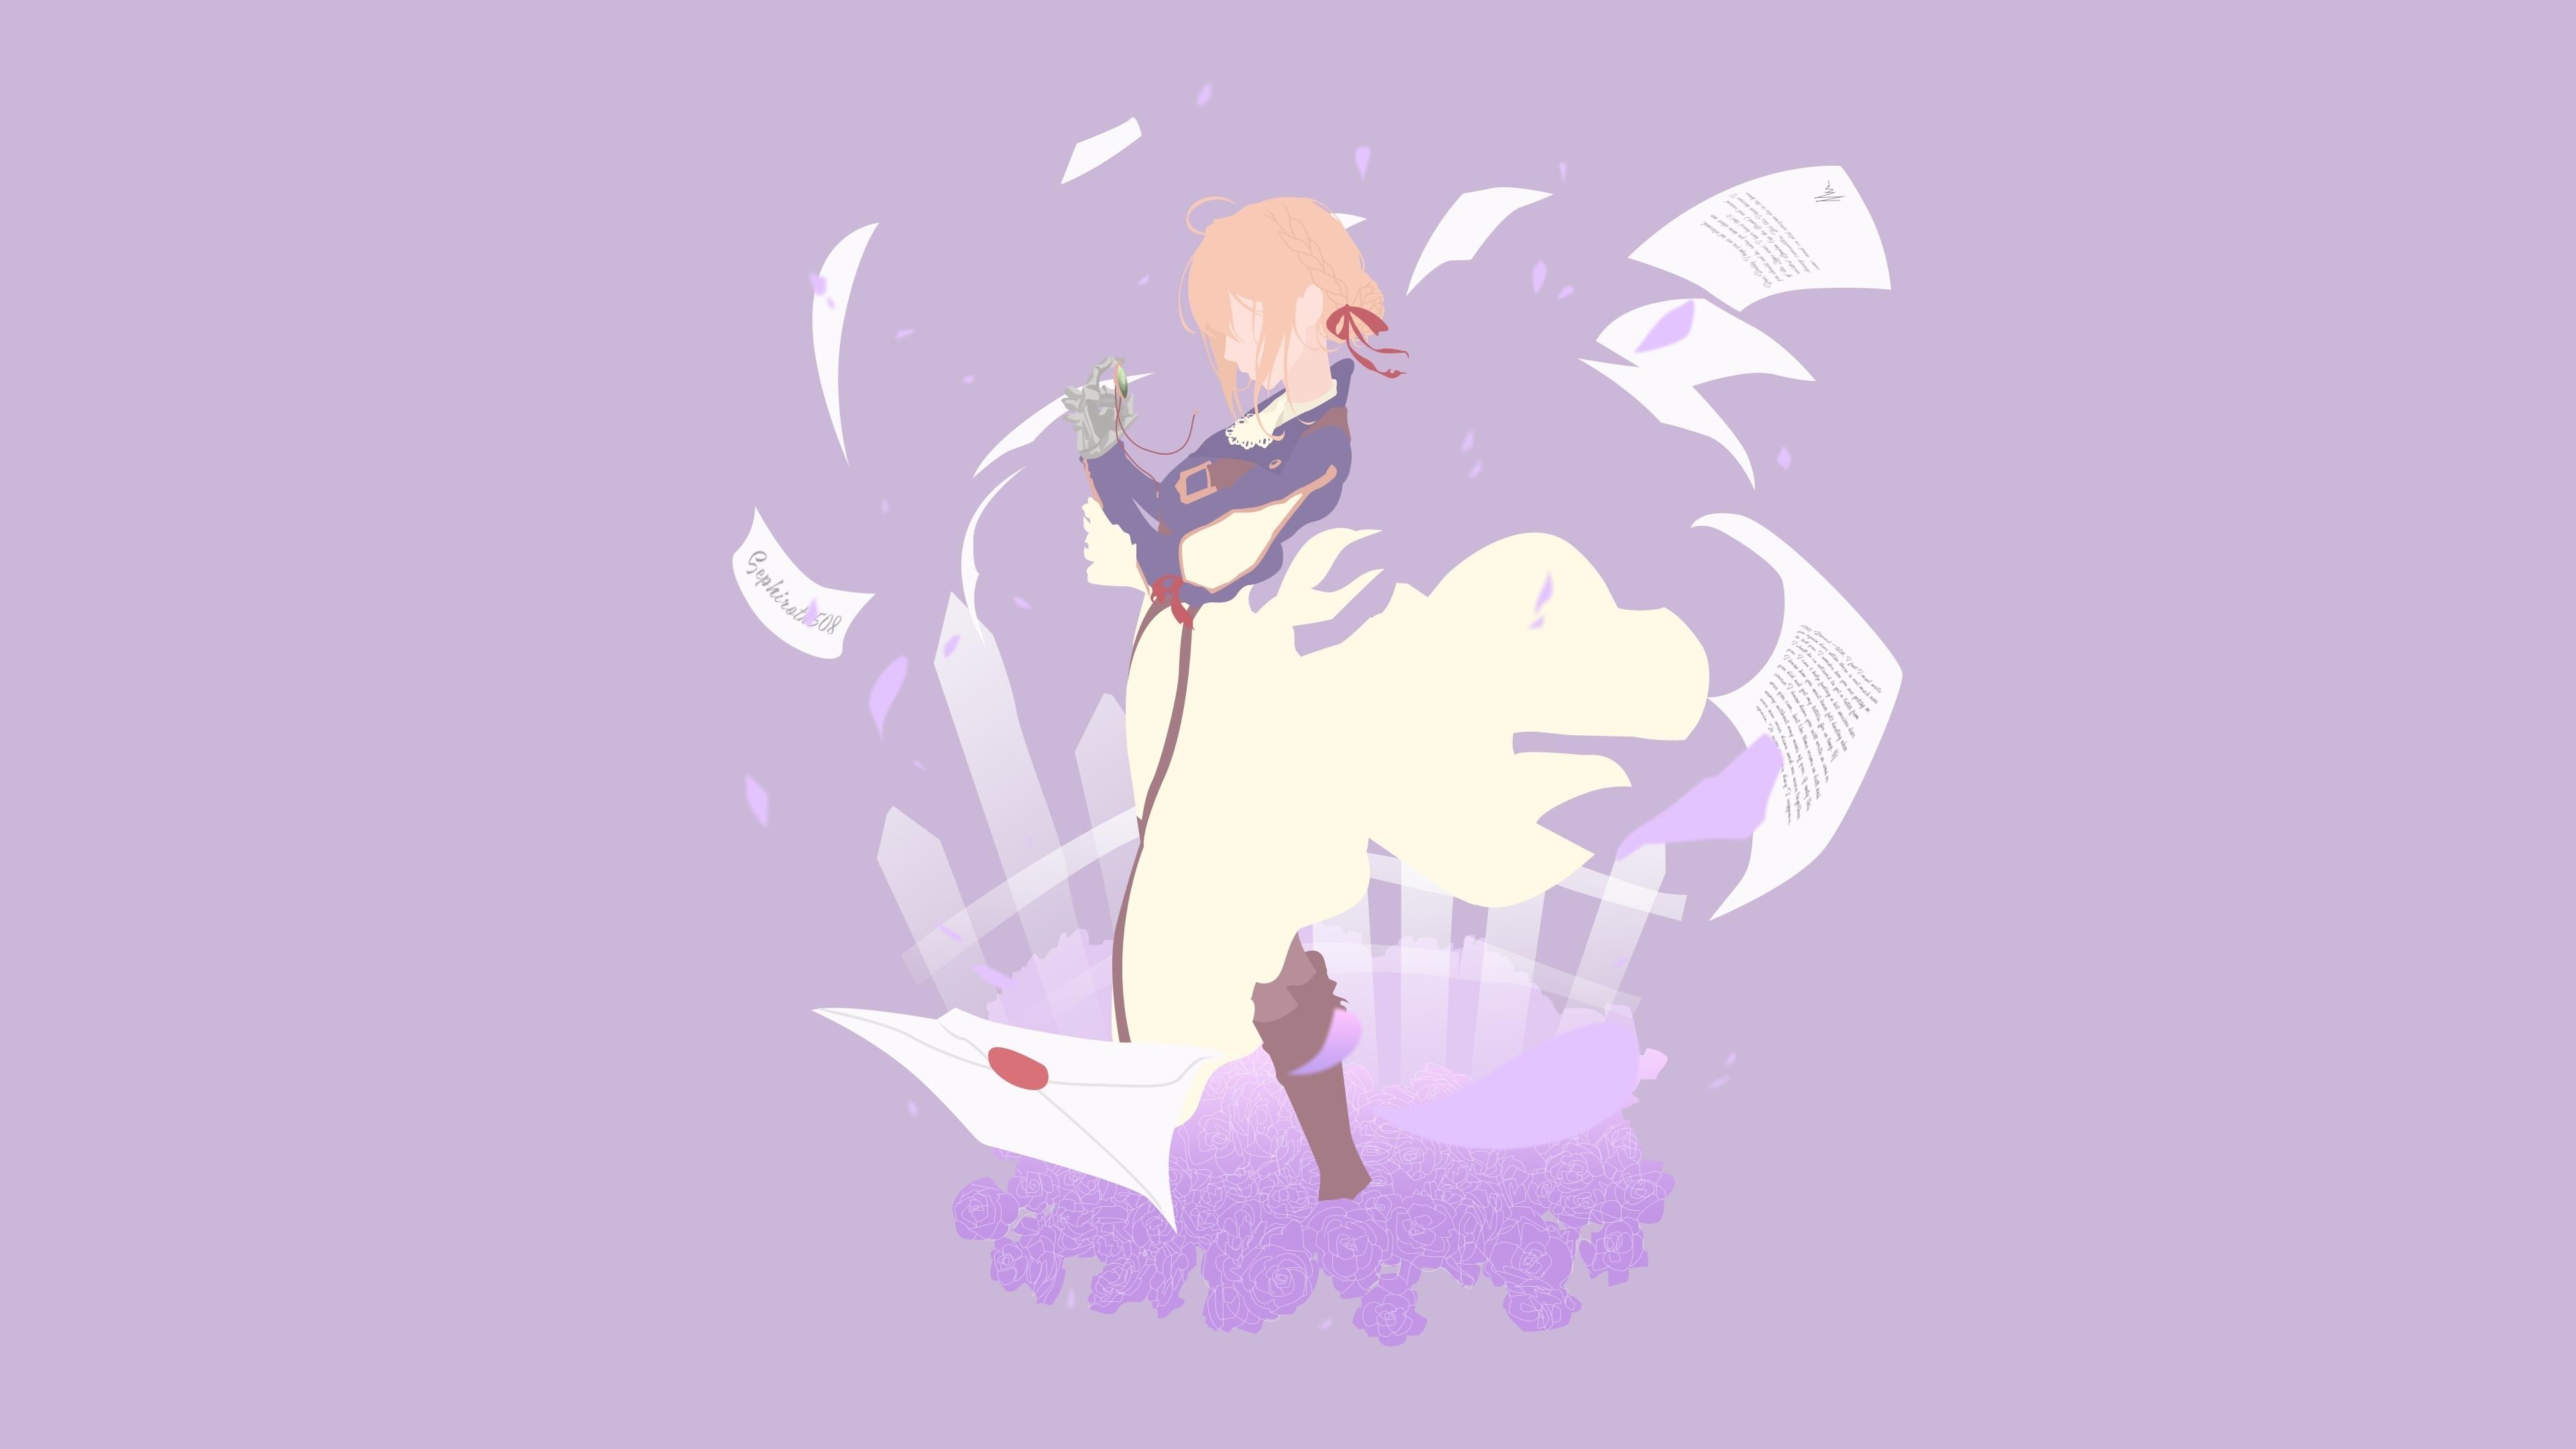 Download 3840x2400 Wallpaper Minimal Violet Evergarden